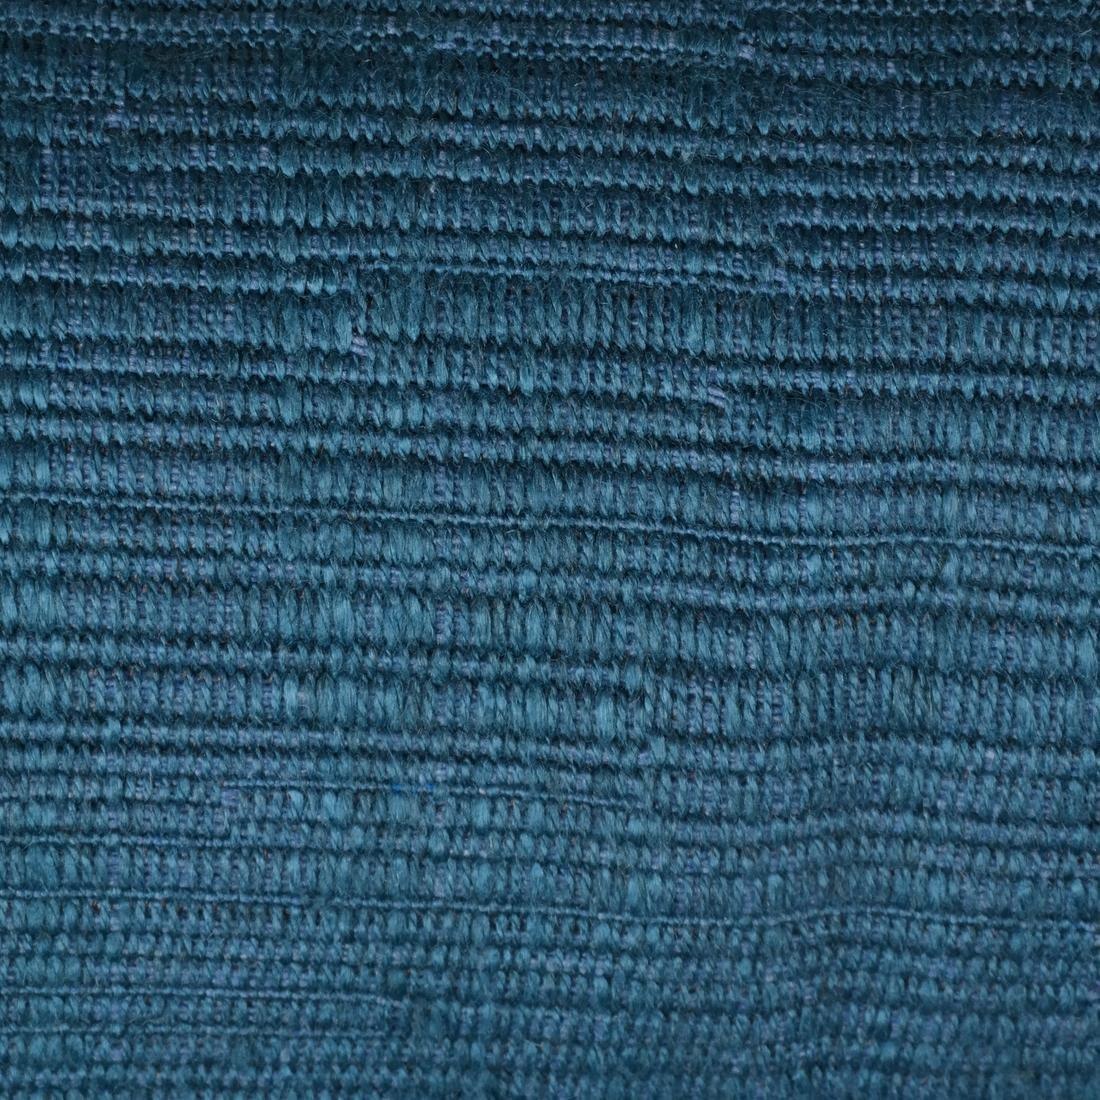 Cowtan & Tout, Zoffany, Allen - Fabrics - 4